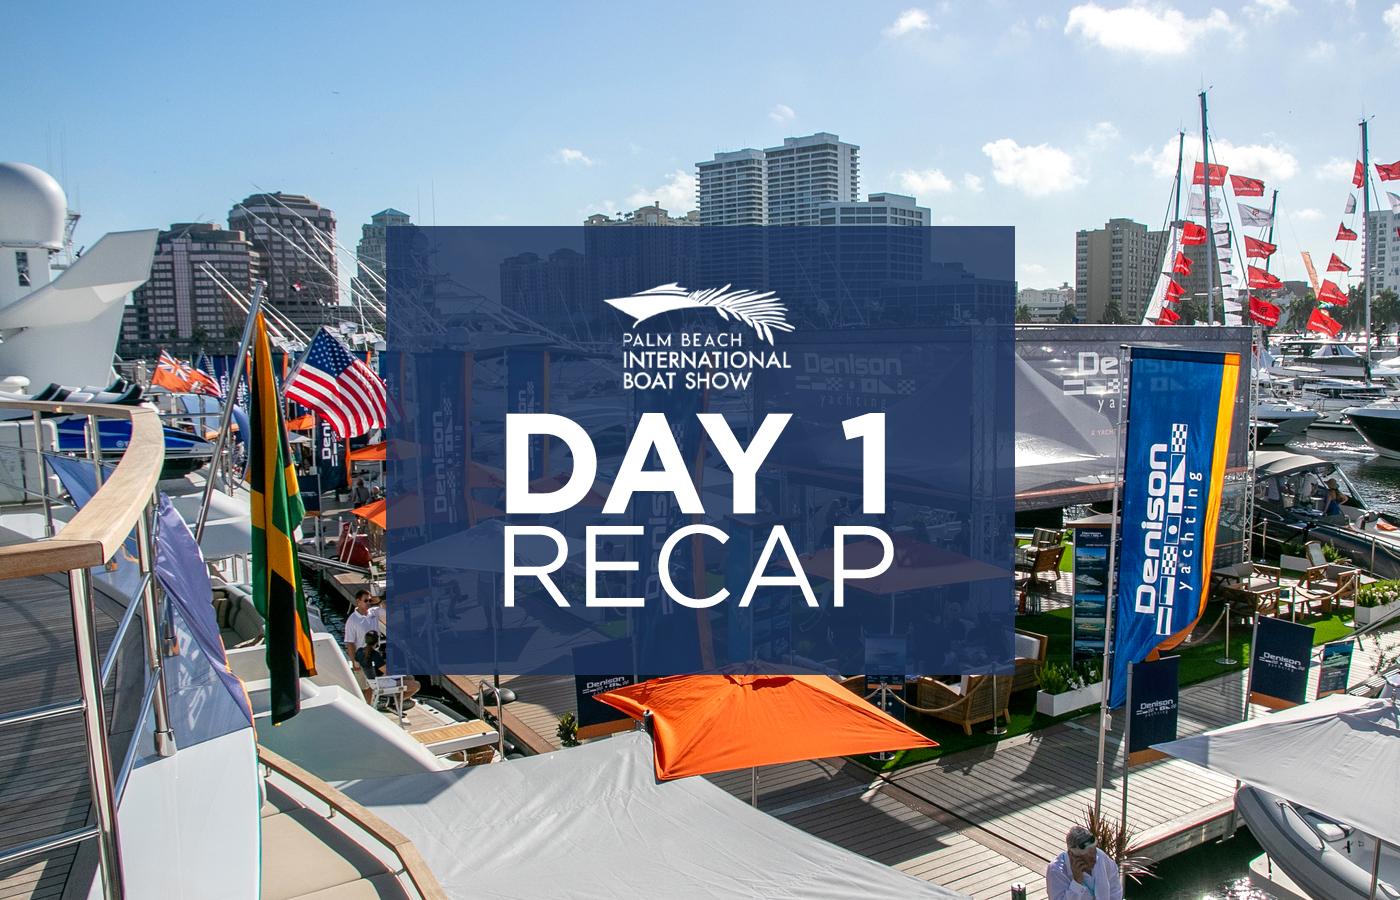 Palm Beach Boat Show 2021 Day 1 Recap